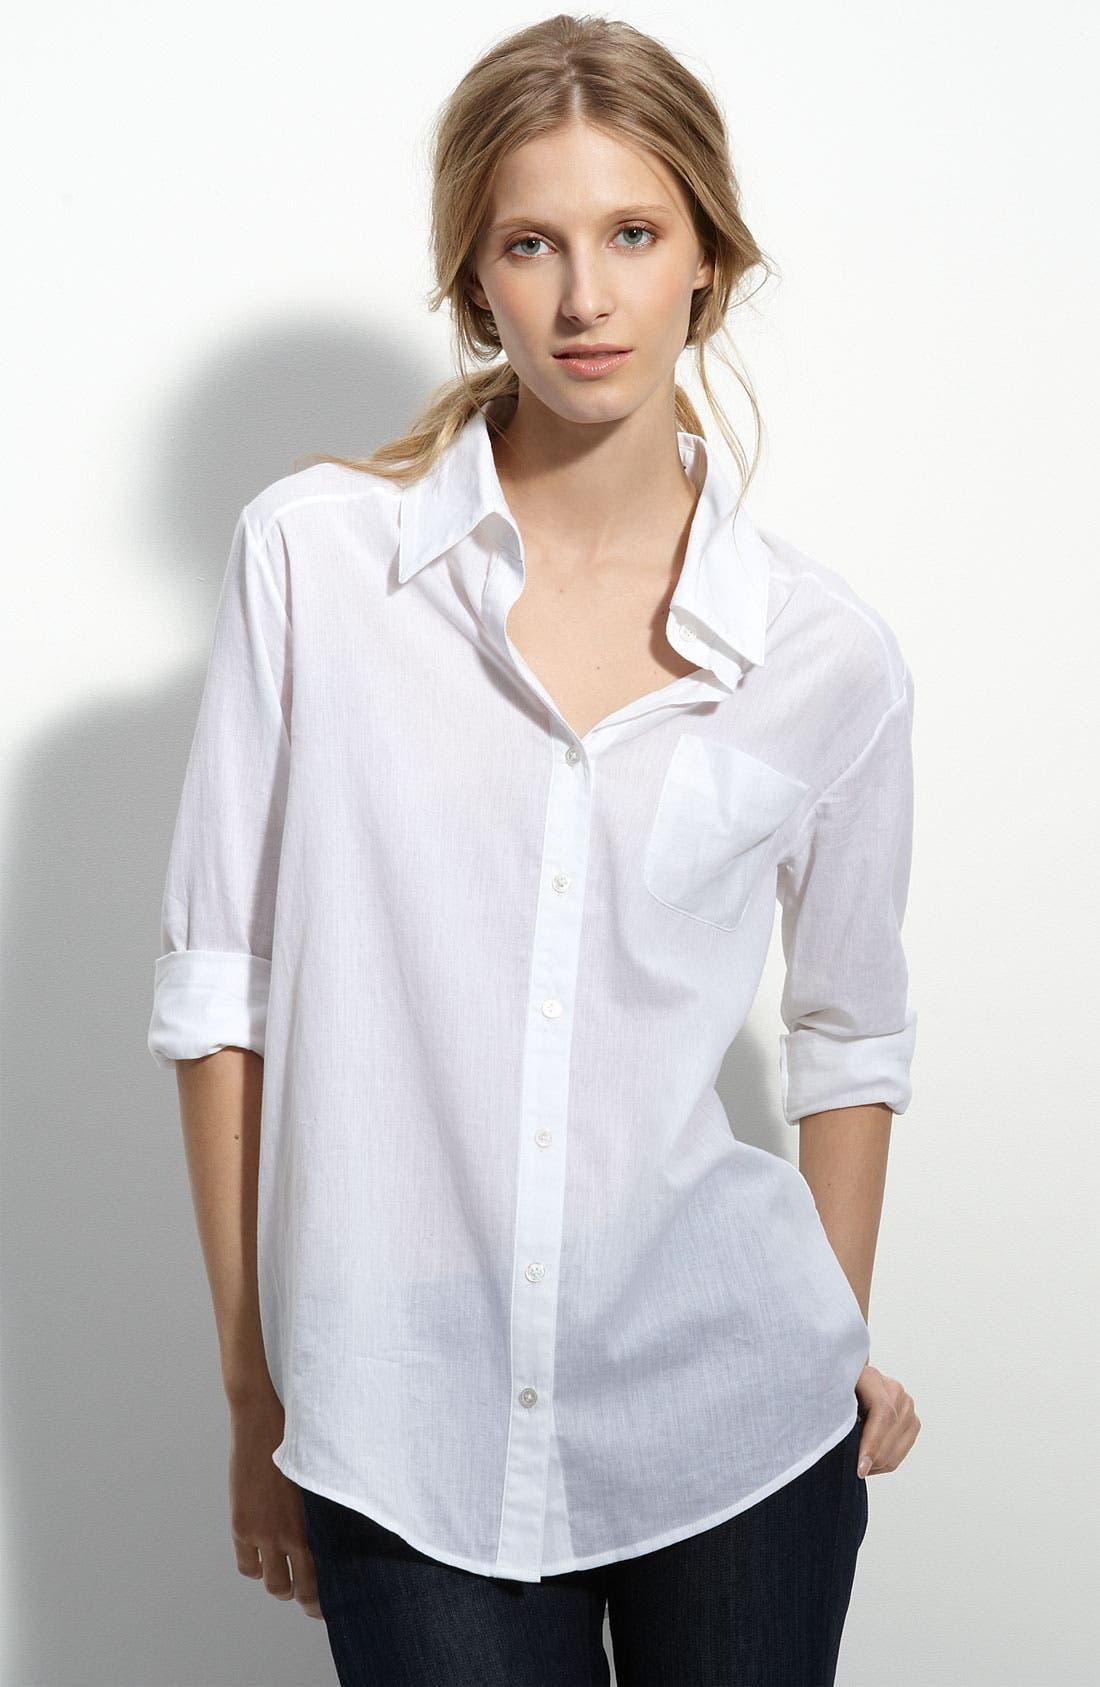 Alternate Image 1 Selected - Elizabeth and James Cotton Shirt